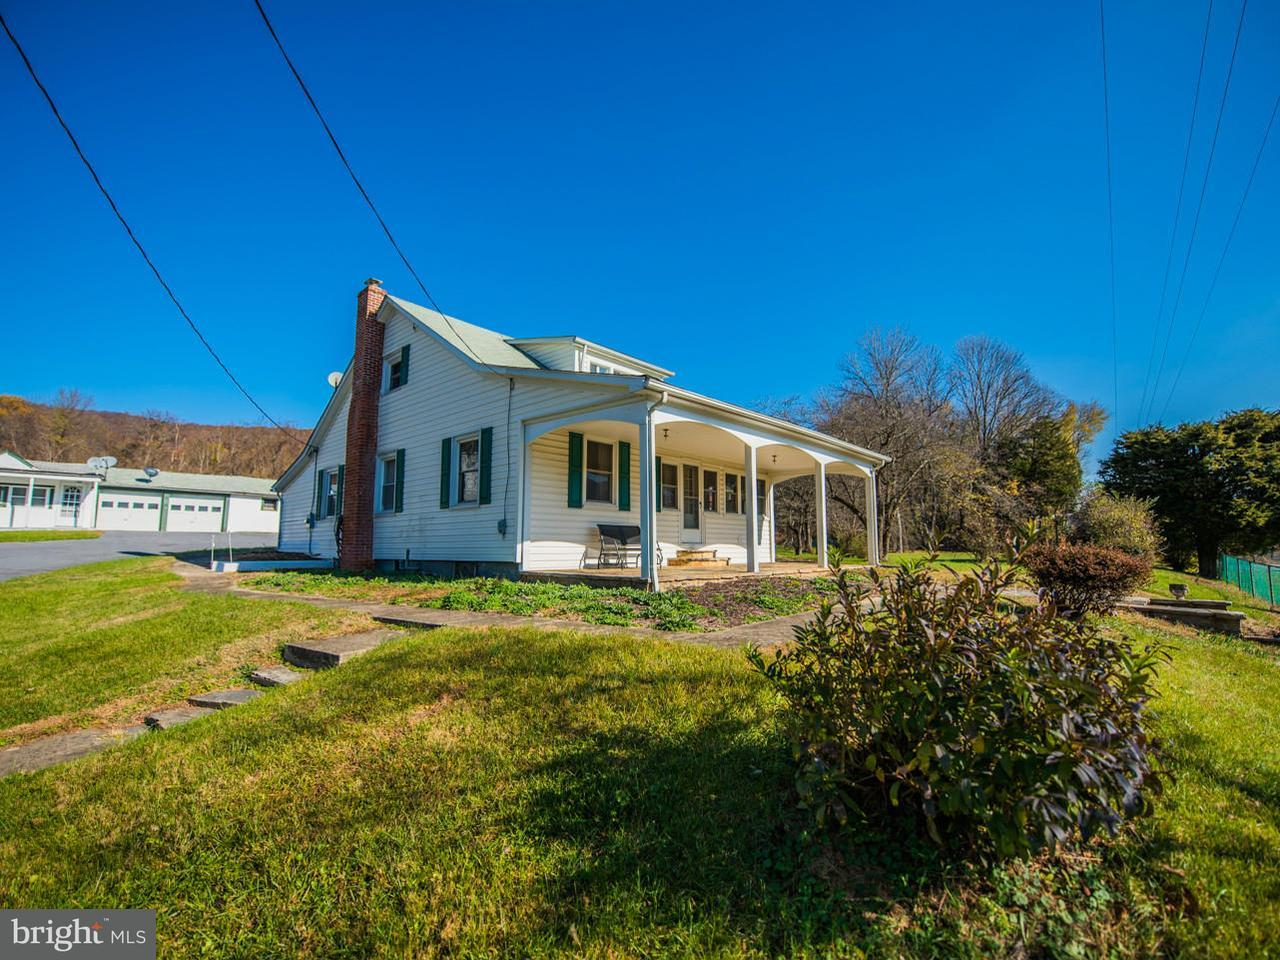 12564 John Marshall Hwy Linden Va Mls 1000129485 Better Homes And Gardens Real Estate